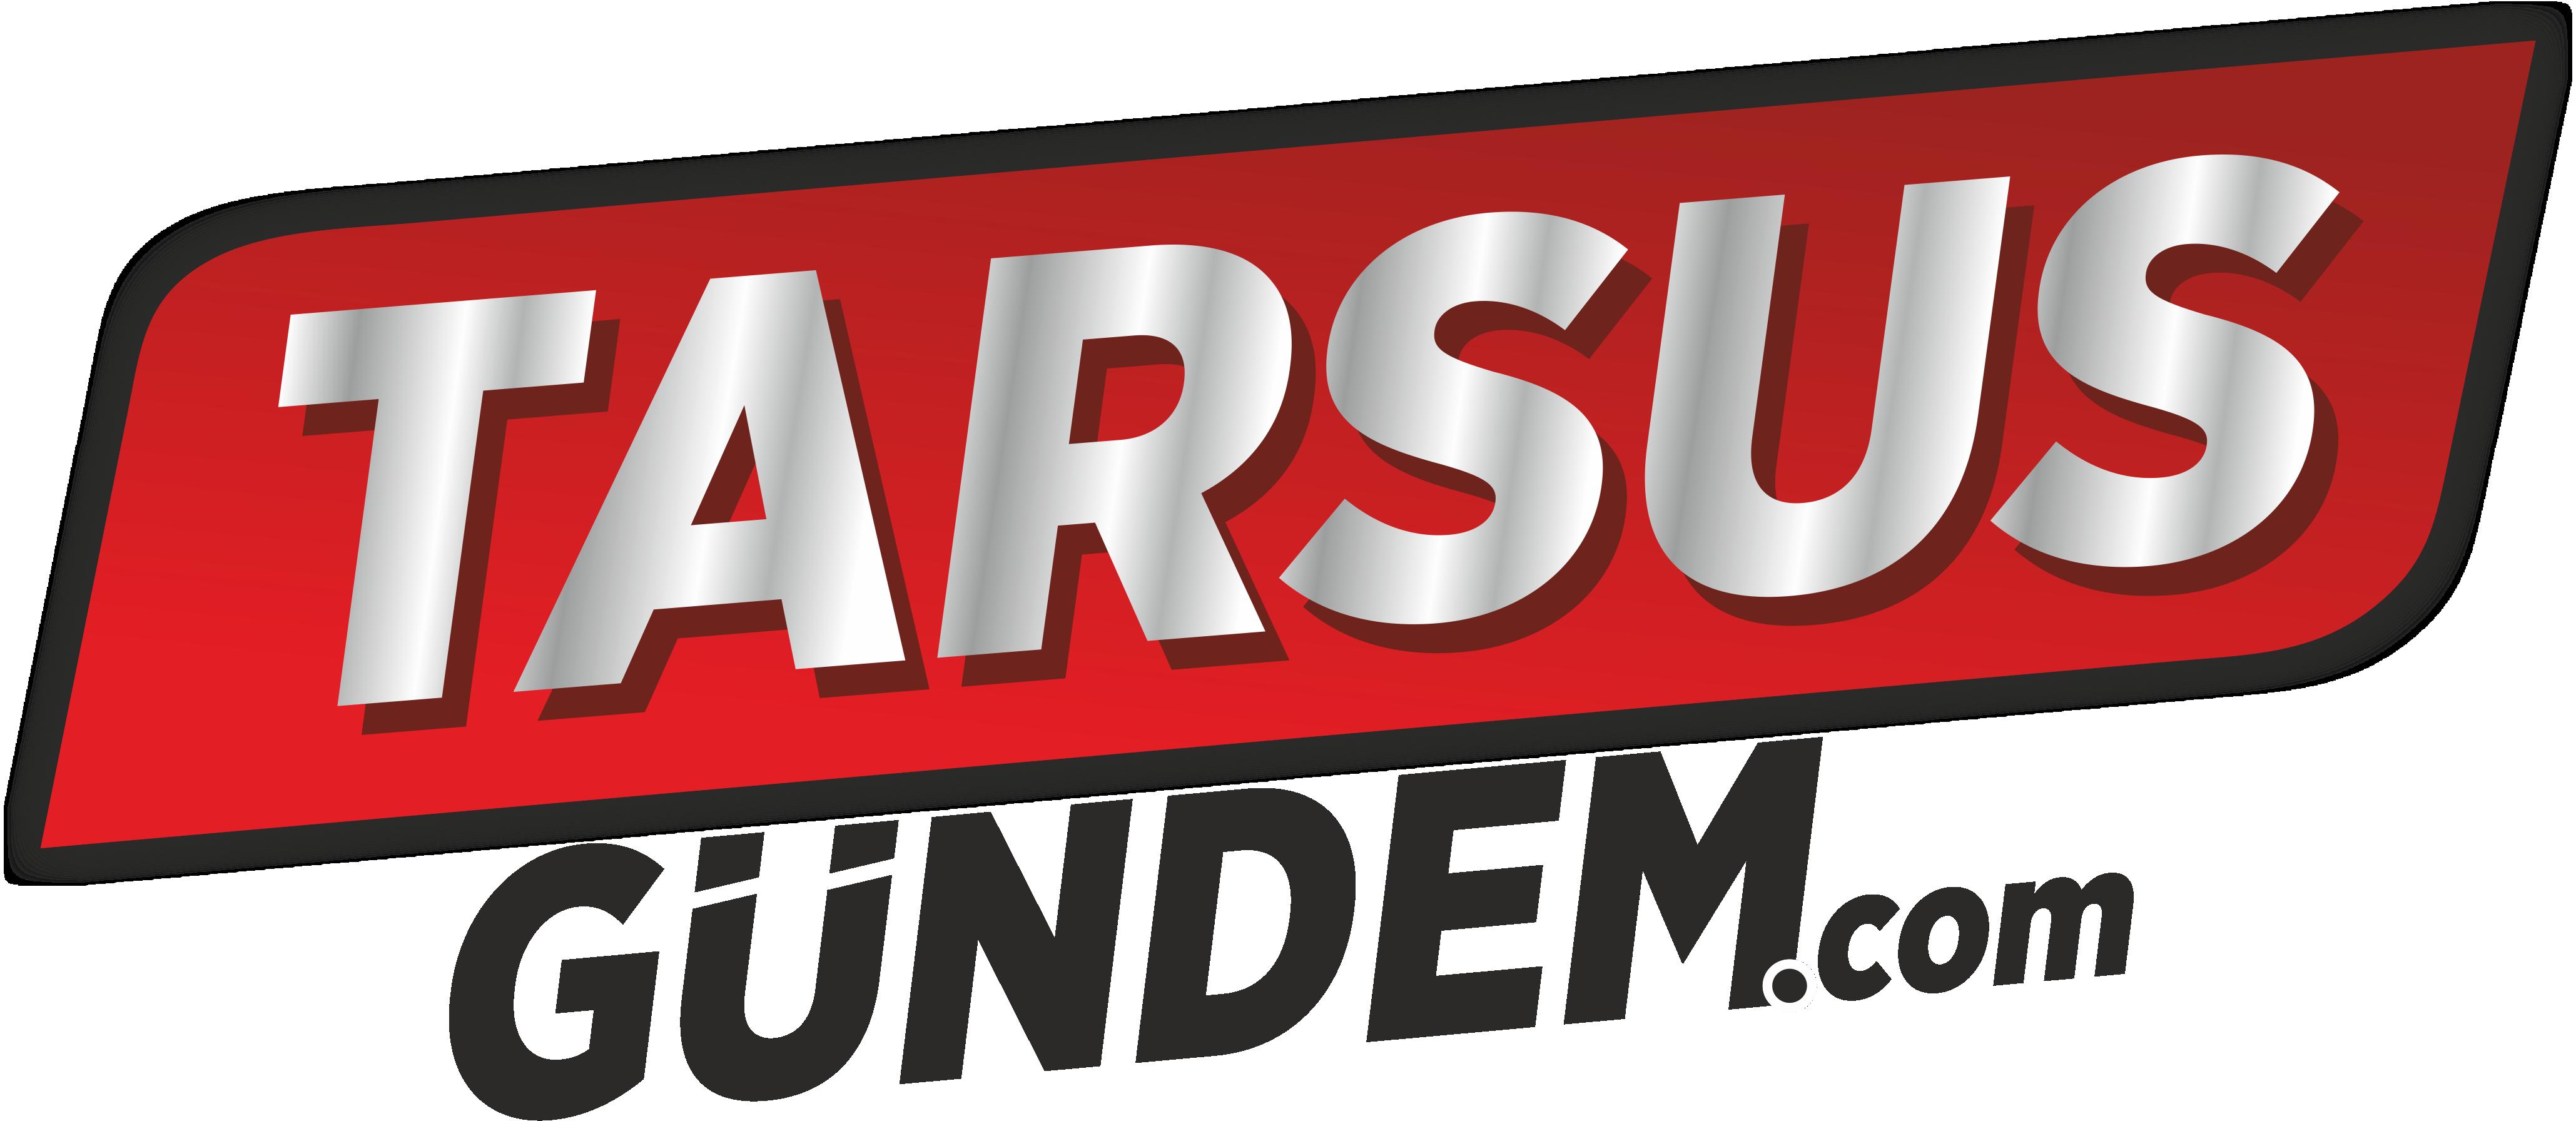 TARSUS GÜNDEM